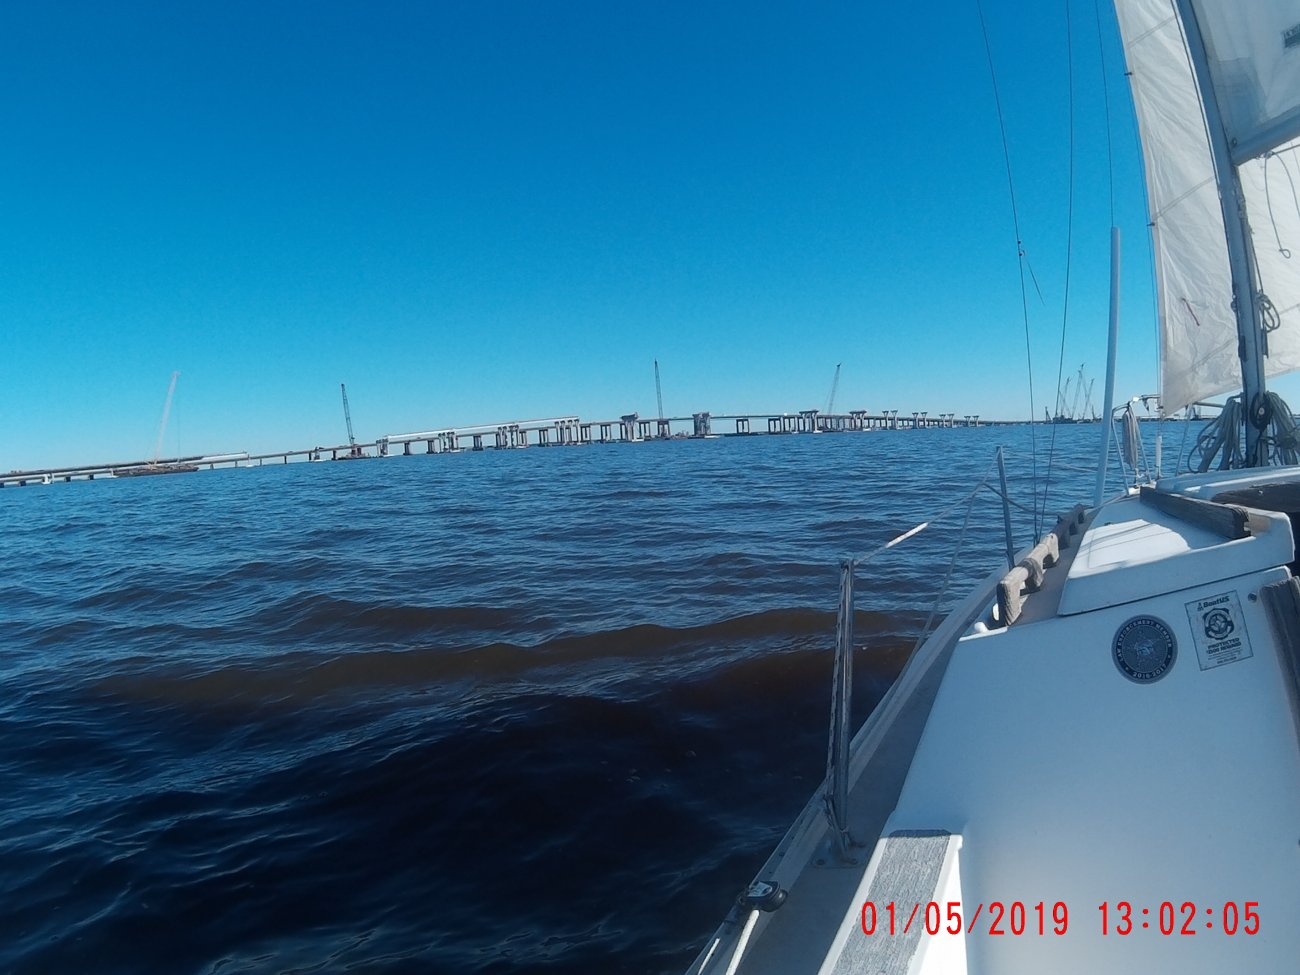 3 mile bridge 1 5 2019 (2).JPG